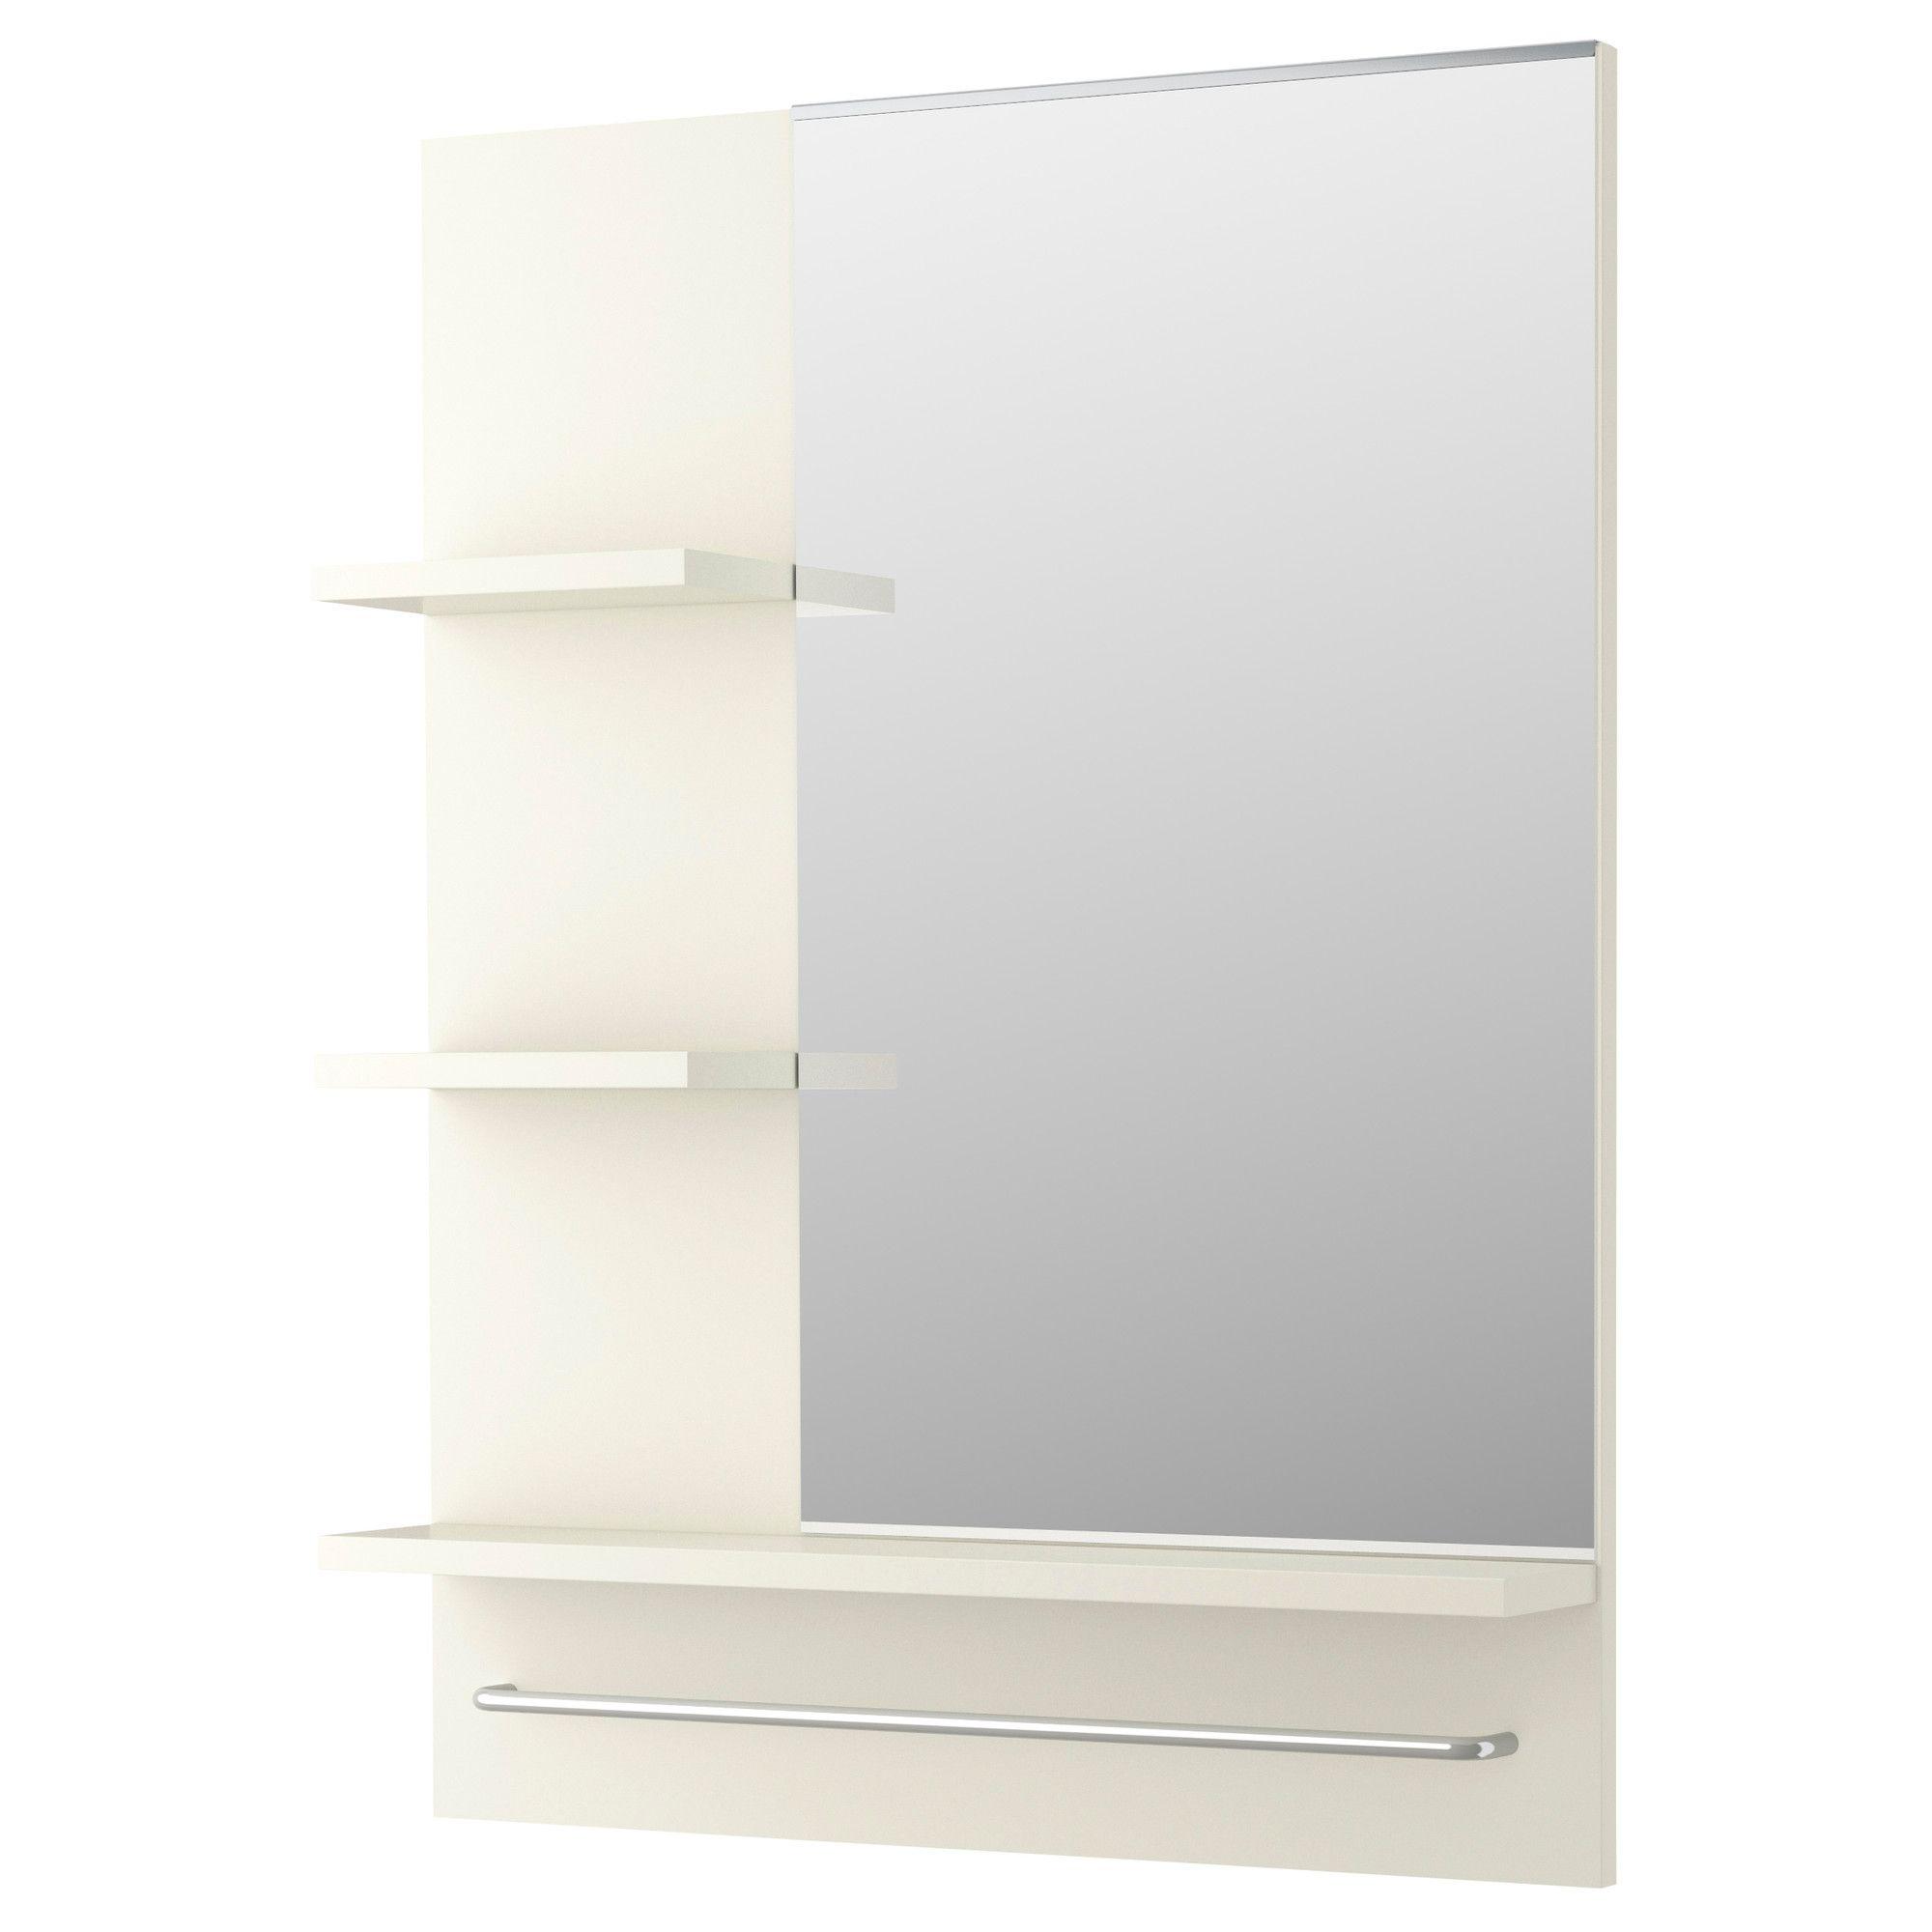 Lill ngen mirror white bath wall mirrors entryway - Illuminated bathroom mirrors ikea ...